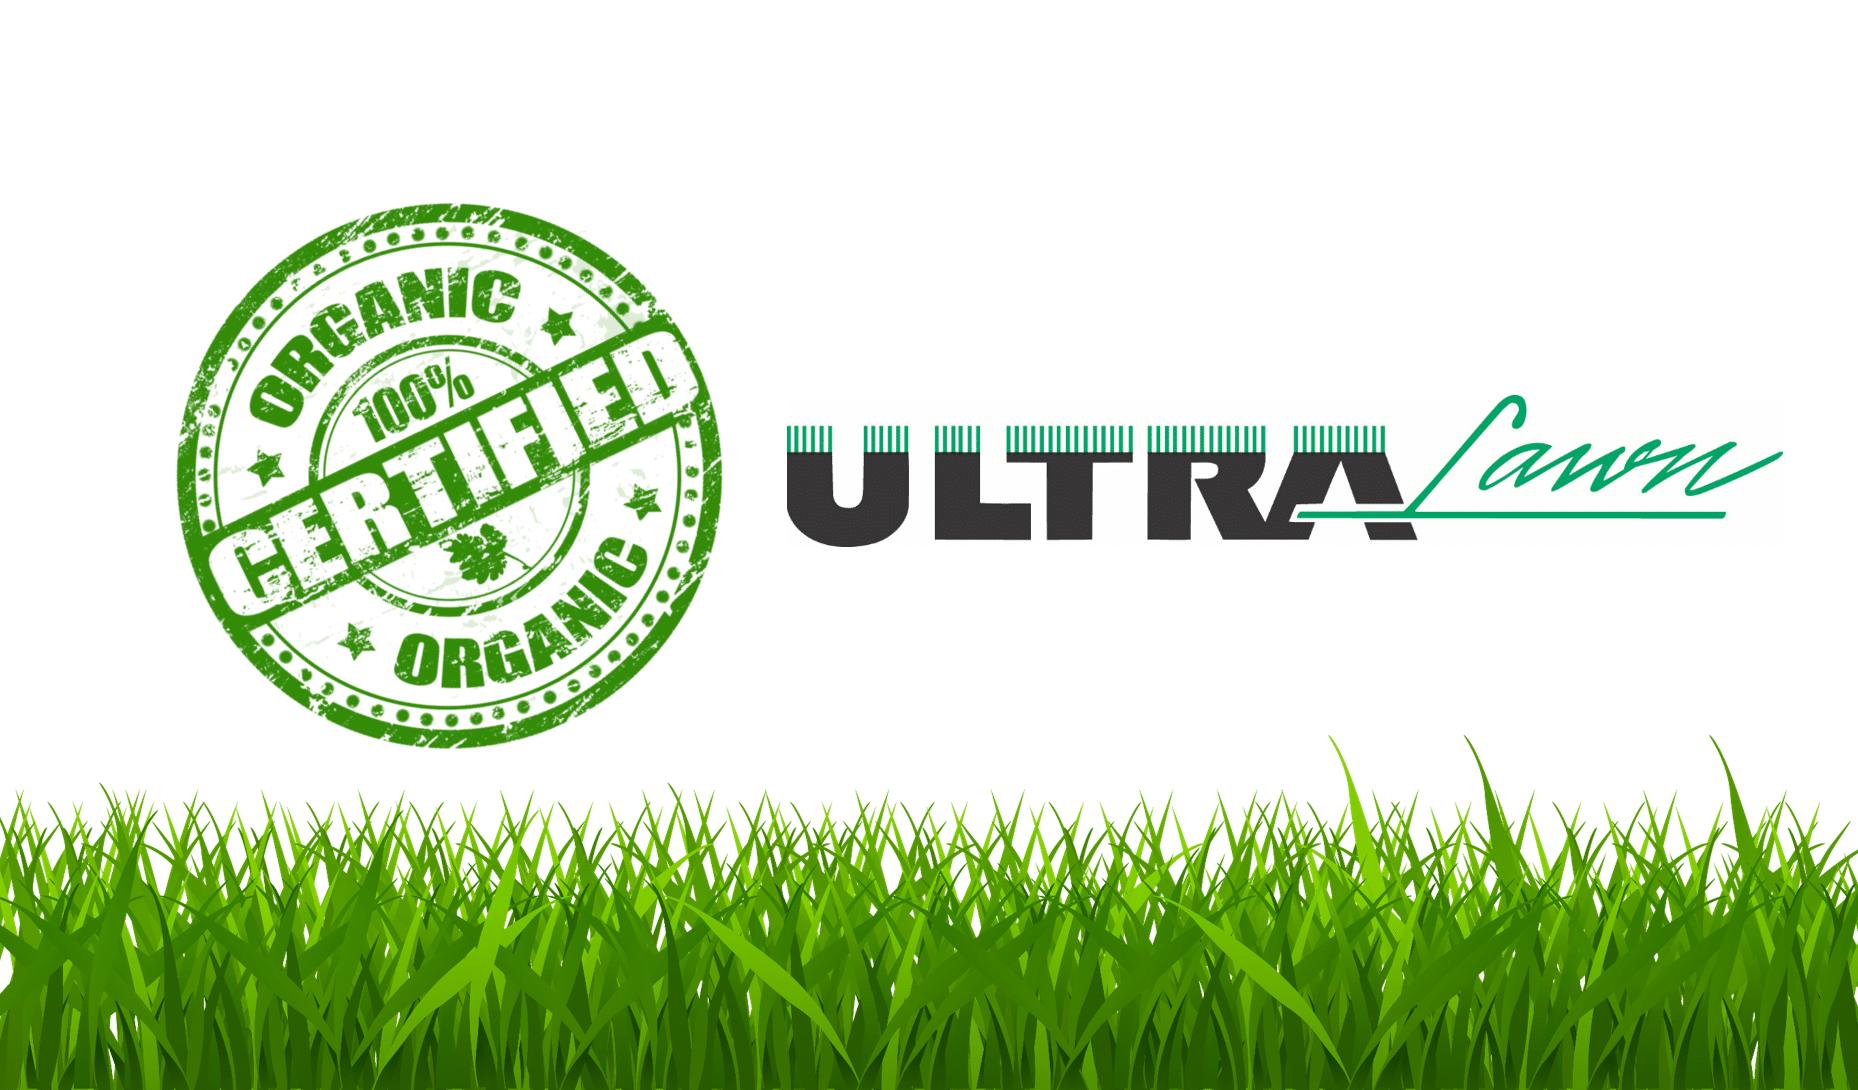 ultra-lawn-organic-lawn-care-fertilizer